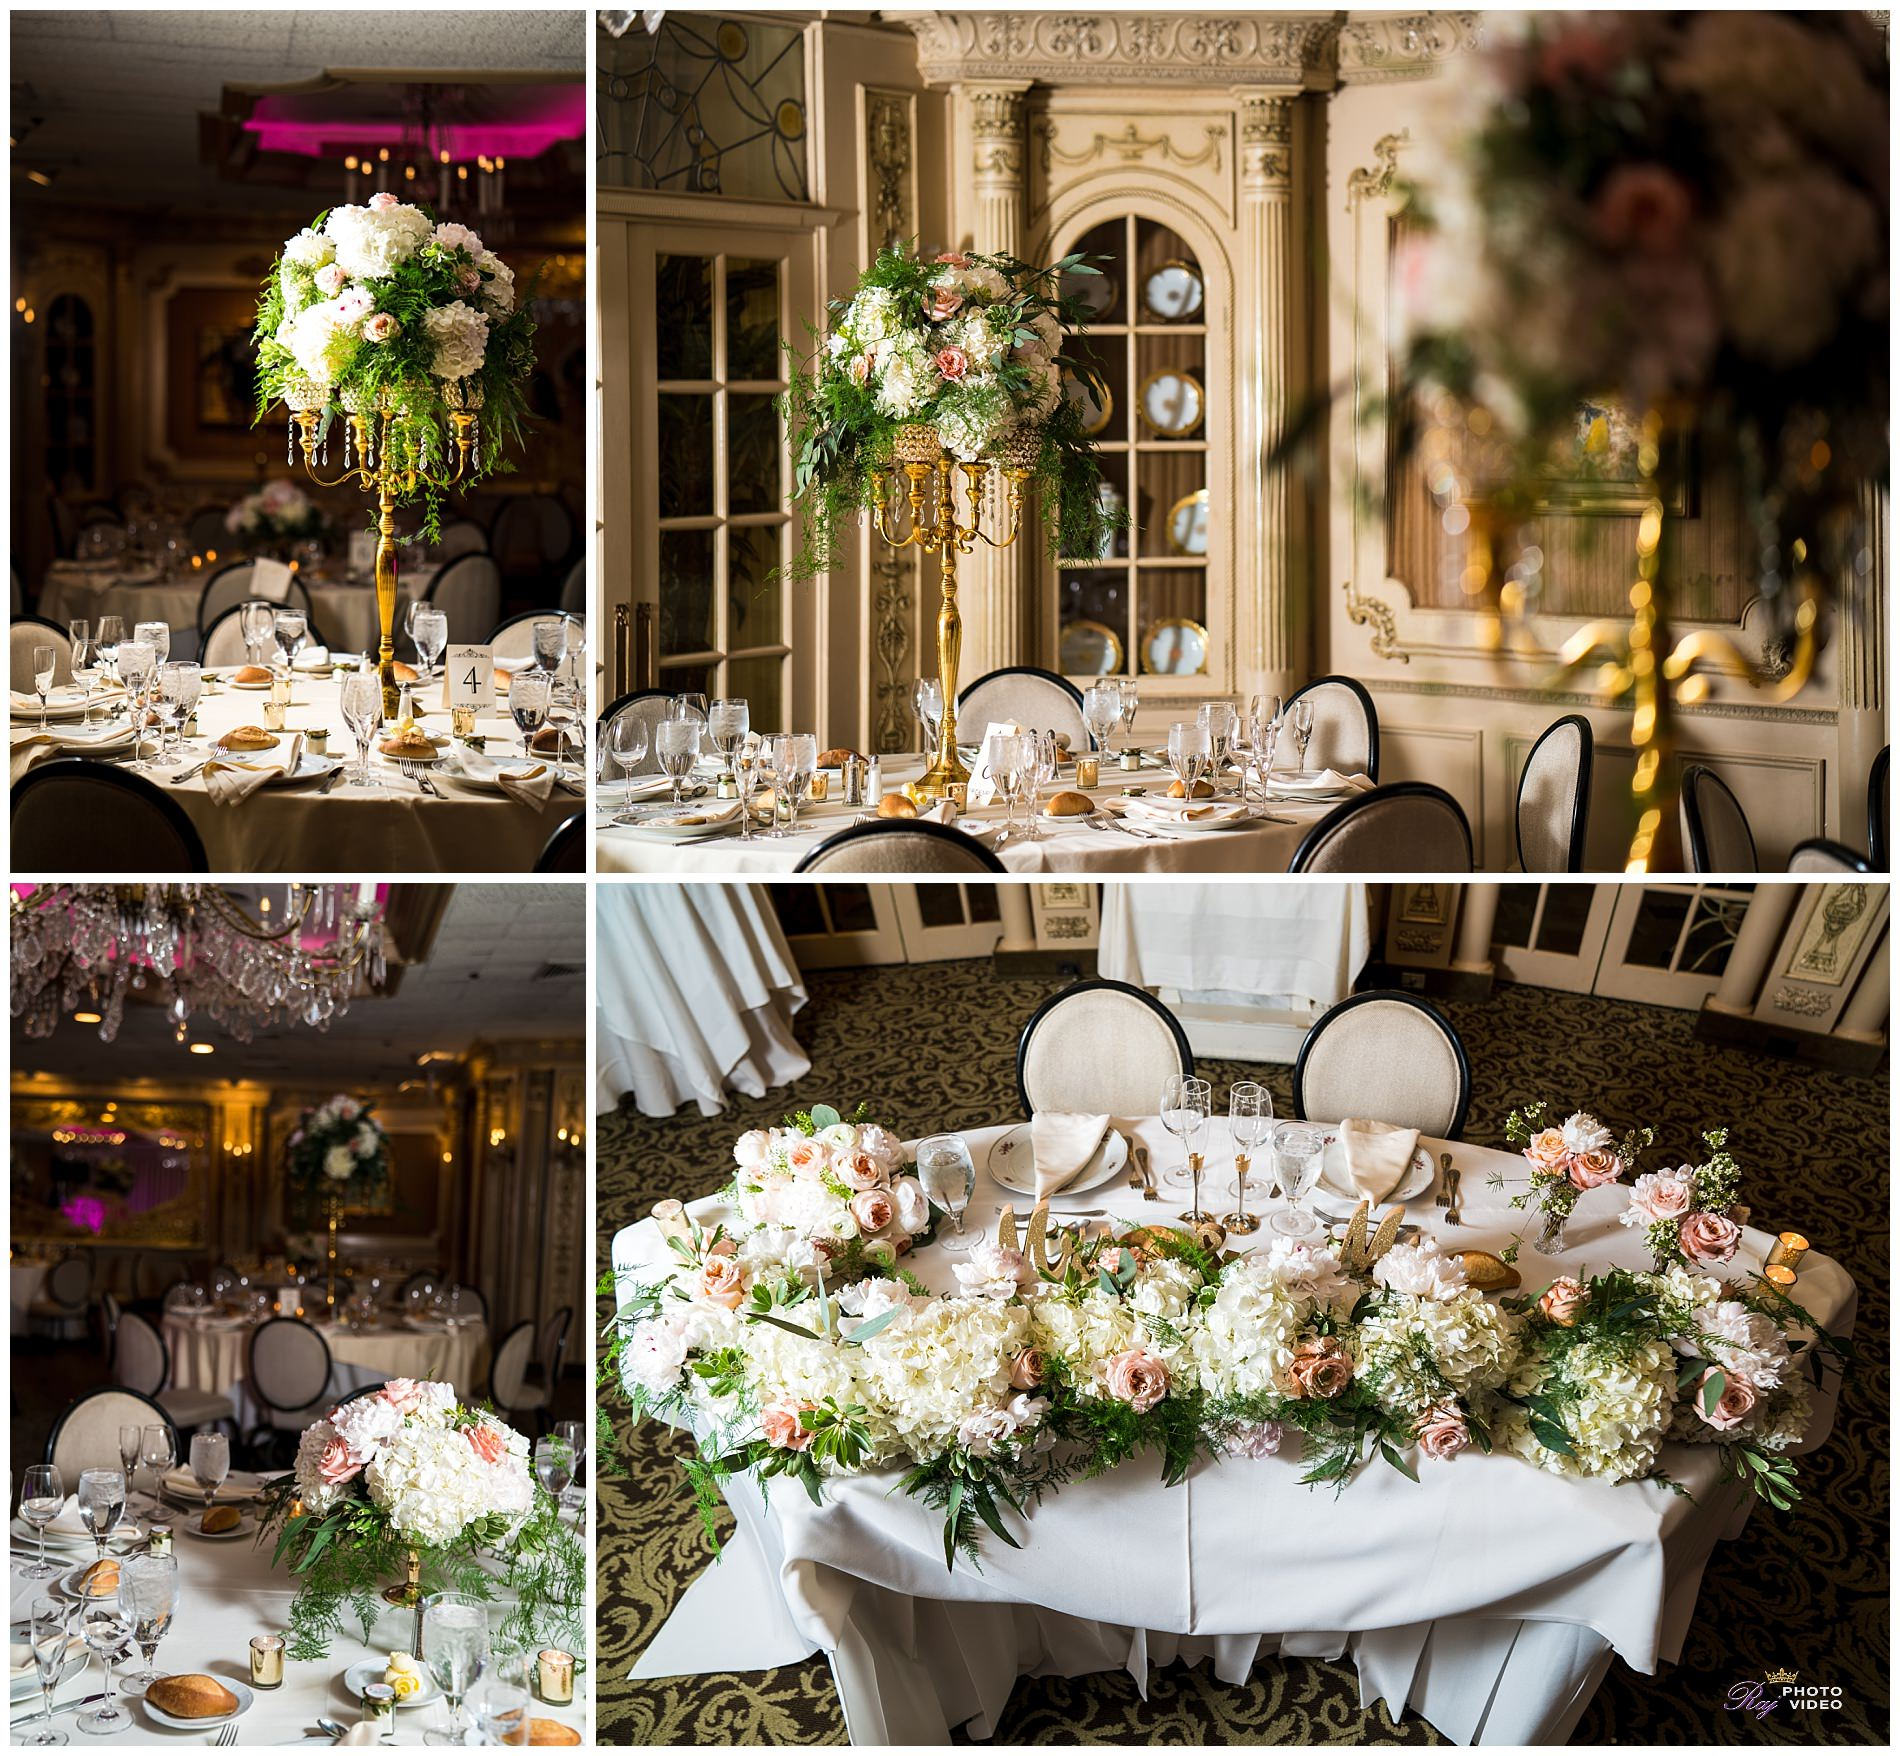 The-Manor-West-Orange-NJ-Wedding-Reception-Yanet-Jose-12.jpg